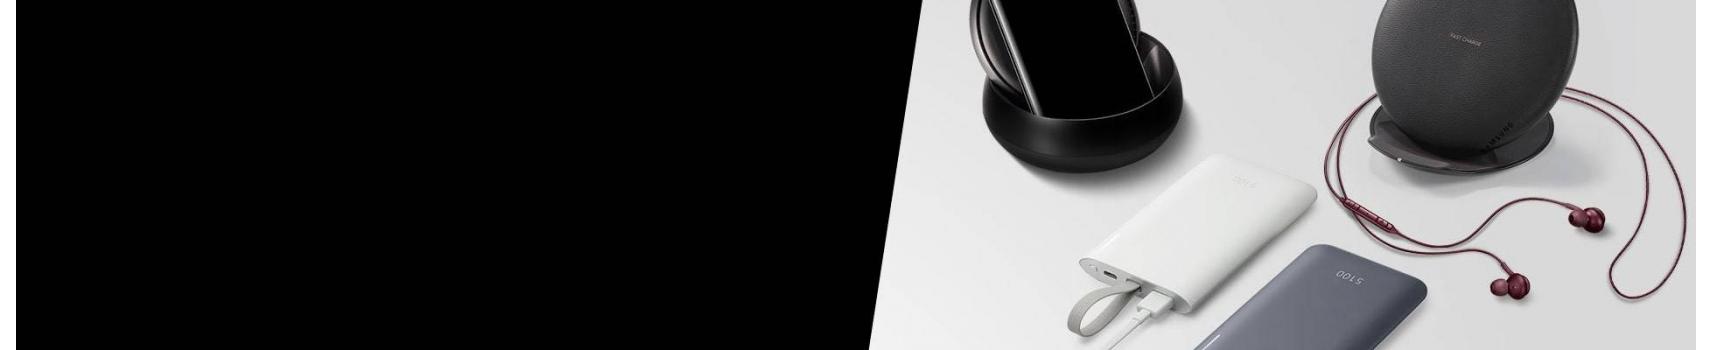 Accessoires Samsung - Batterie - Chargeur - Audio | Samsung Tunisie